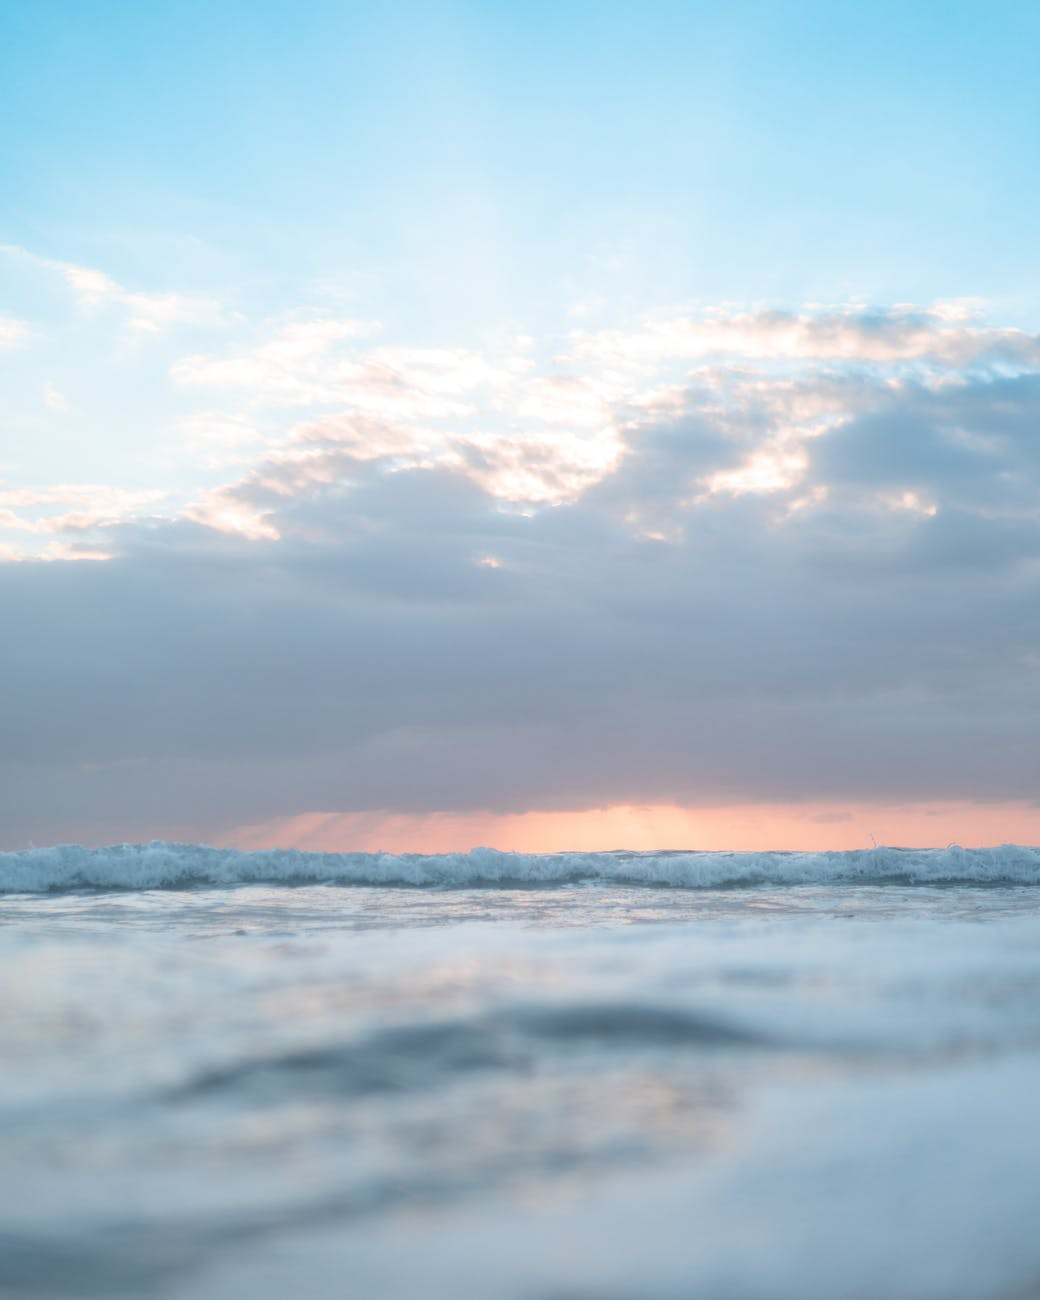 rippling wavy sea under blue cloudy sky